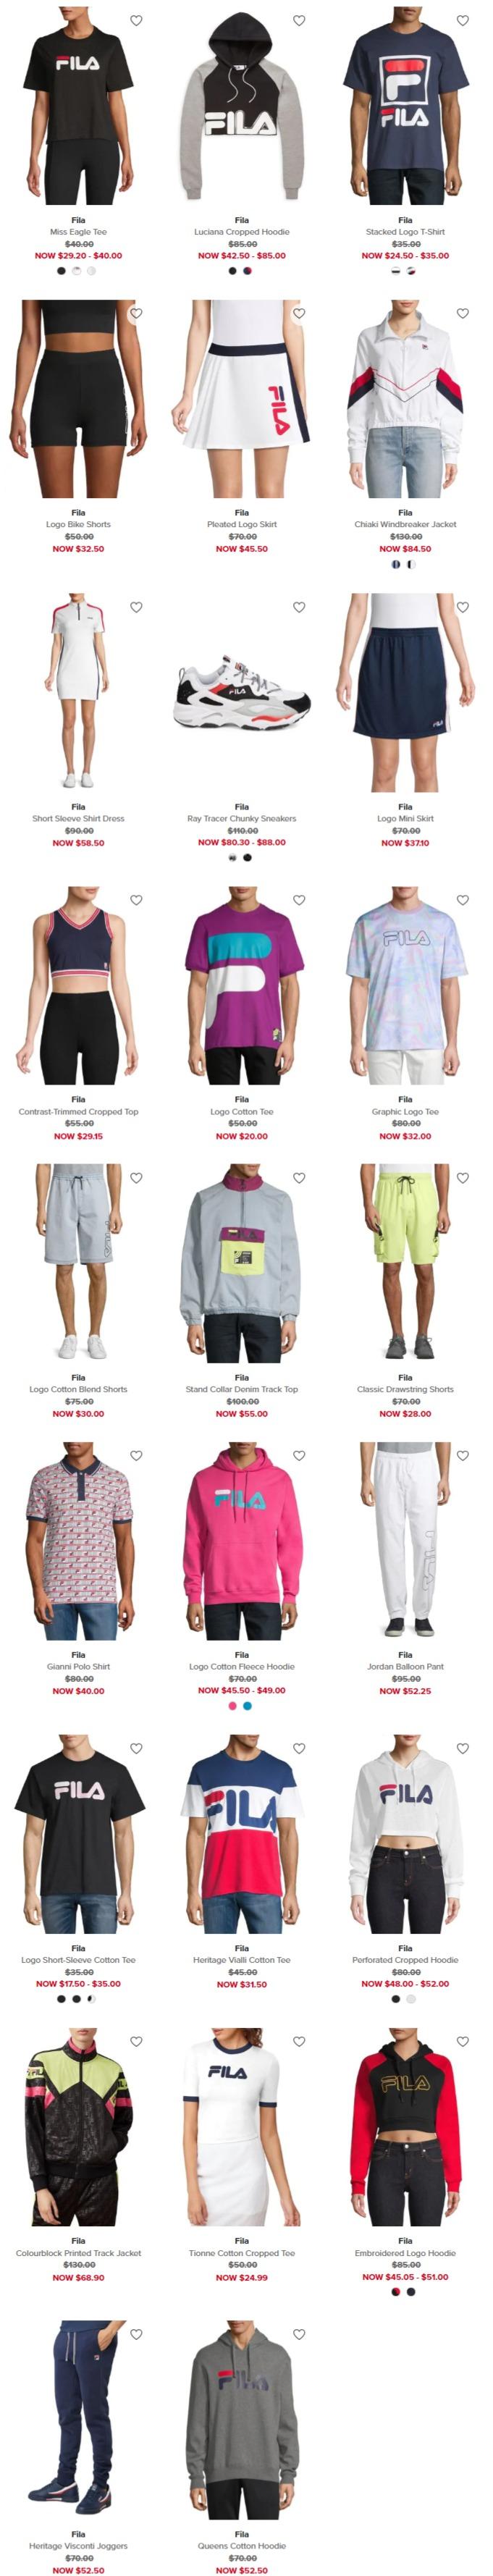 FILA 斐乐时尚卫衣、运动裤、运动鞋4折起+额外8折+全场包邮!